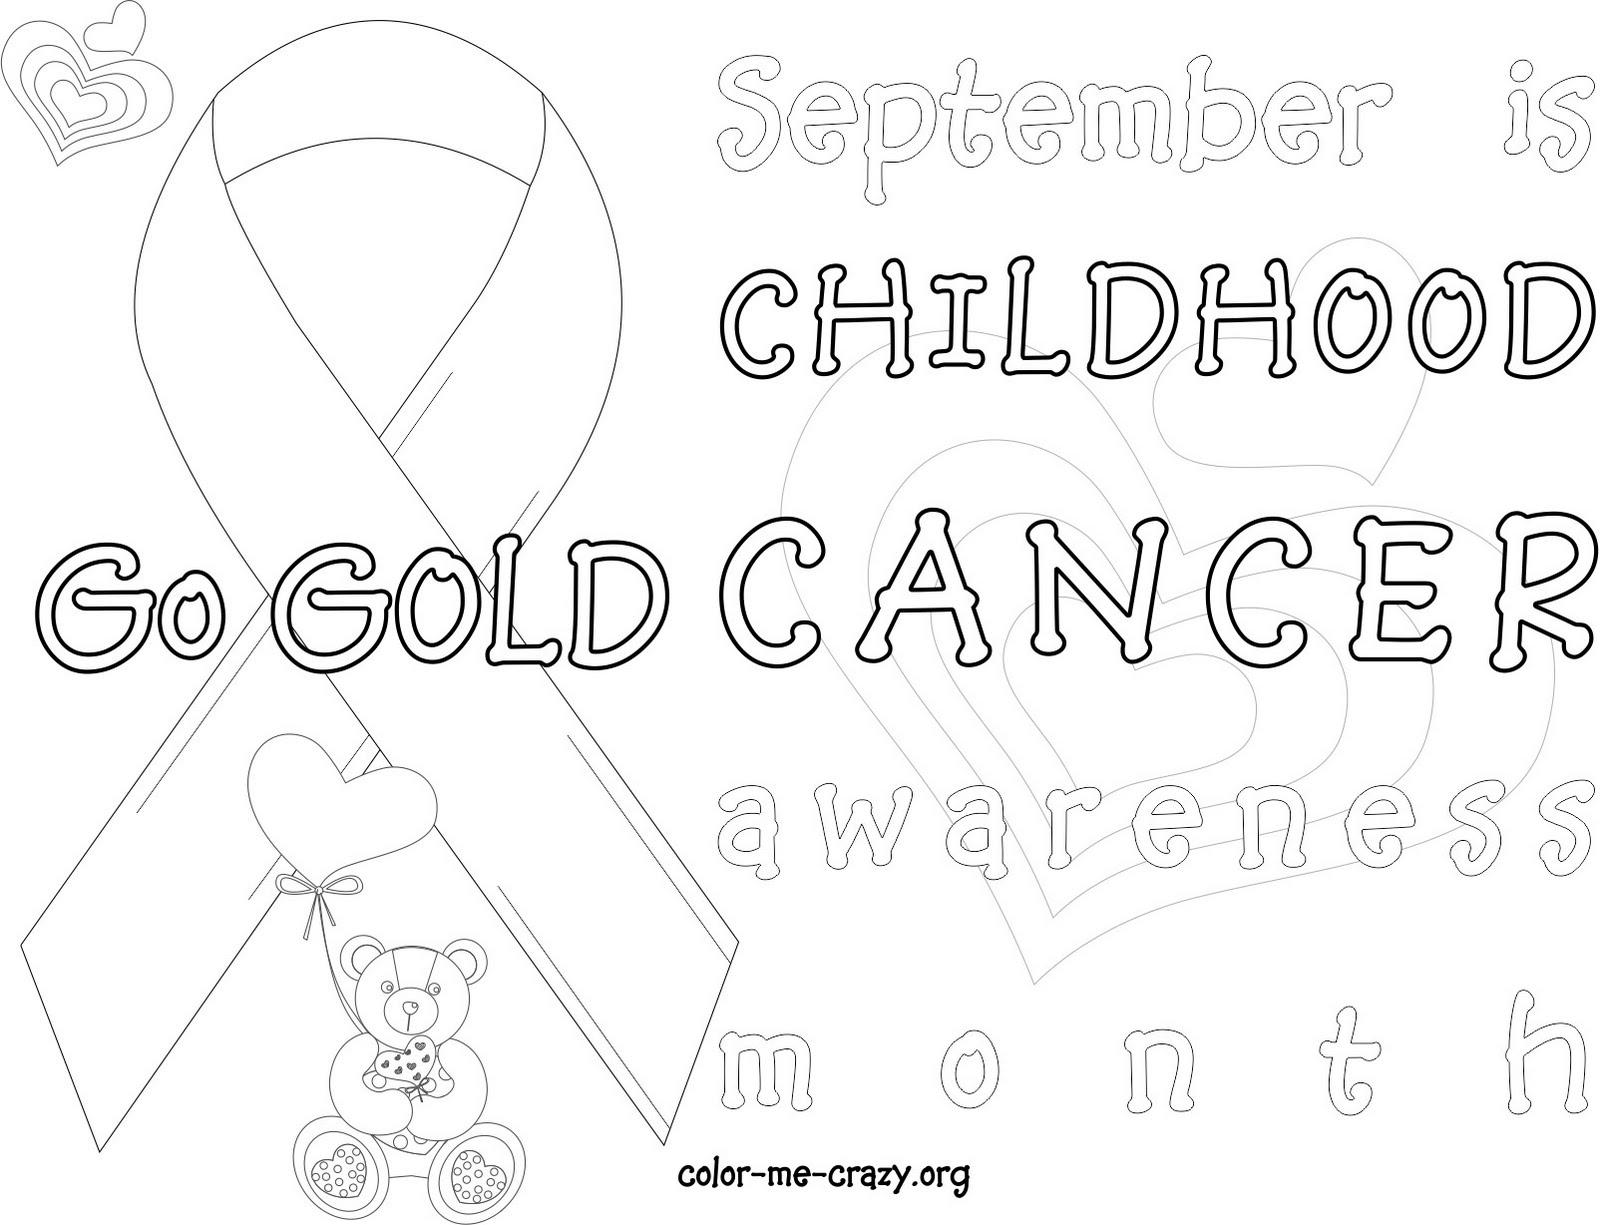 awareness ribbon coloring pages - photo#23